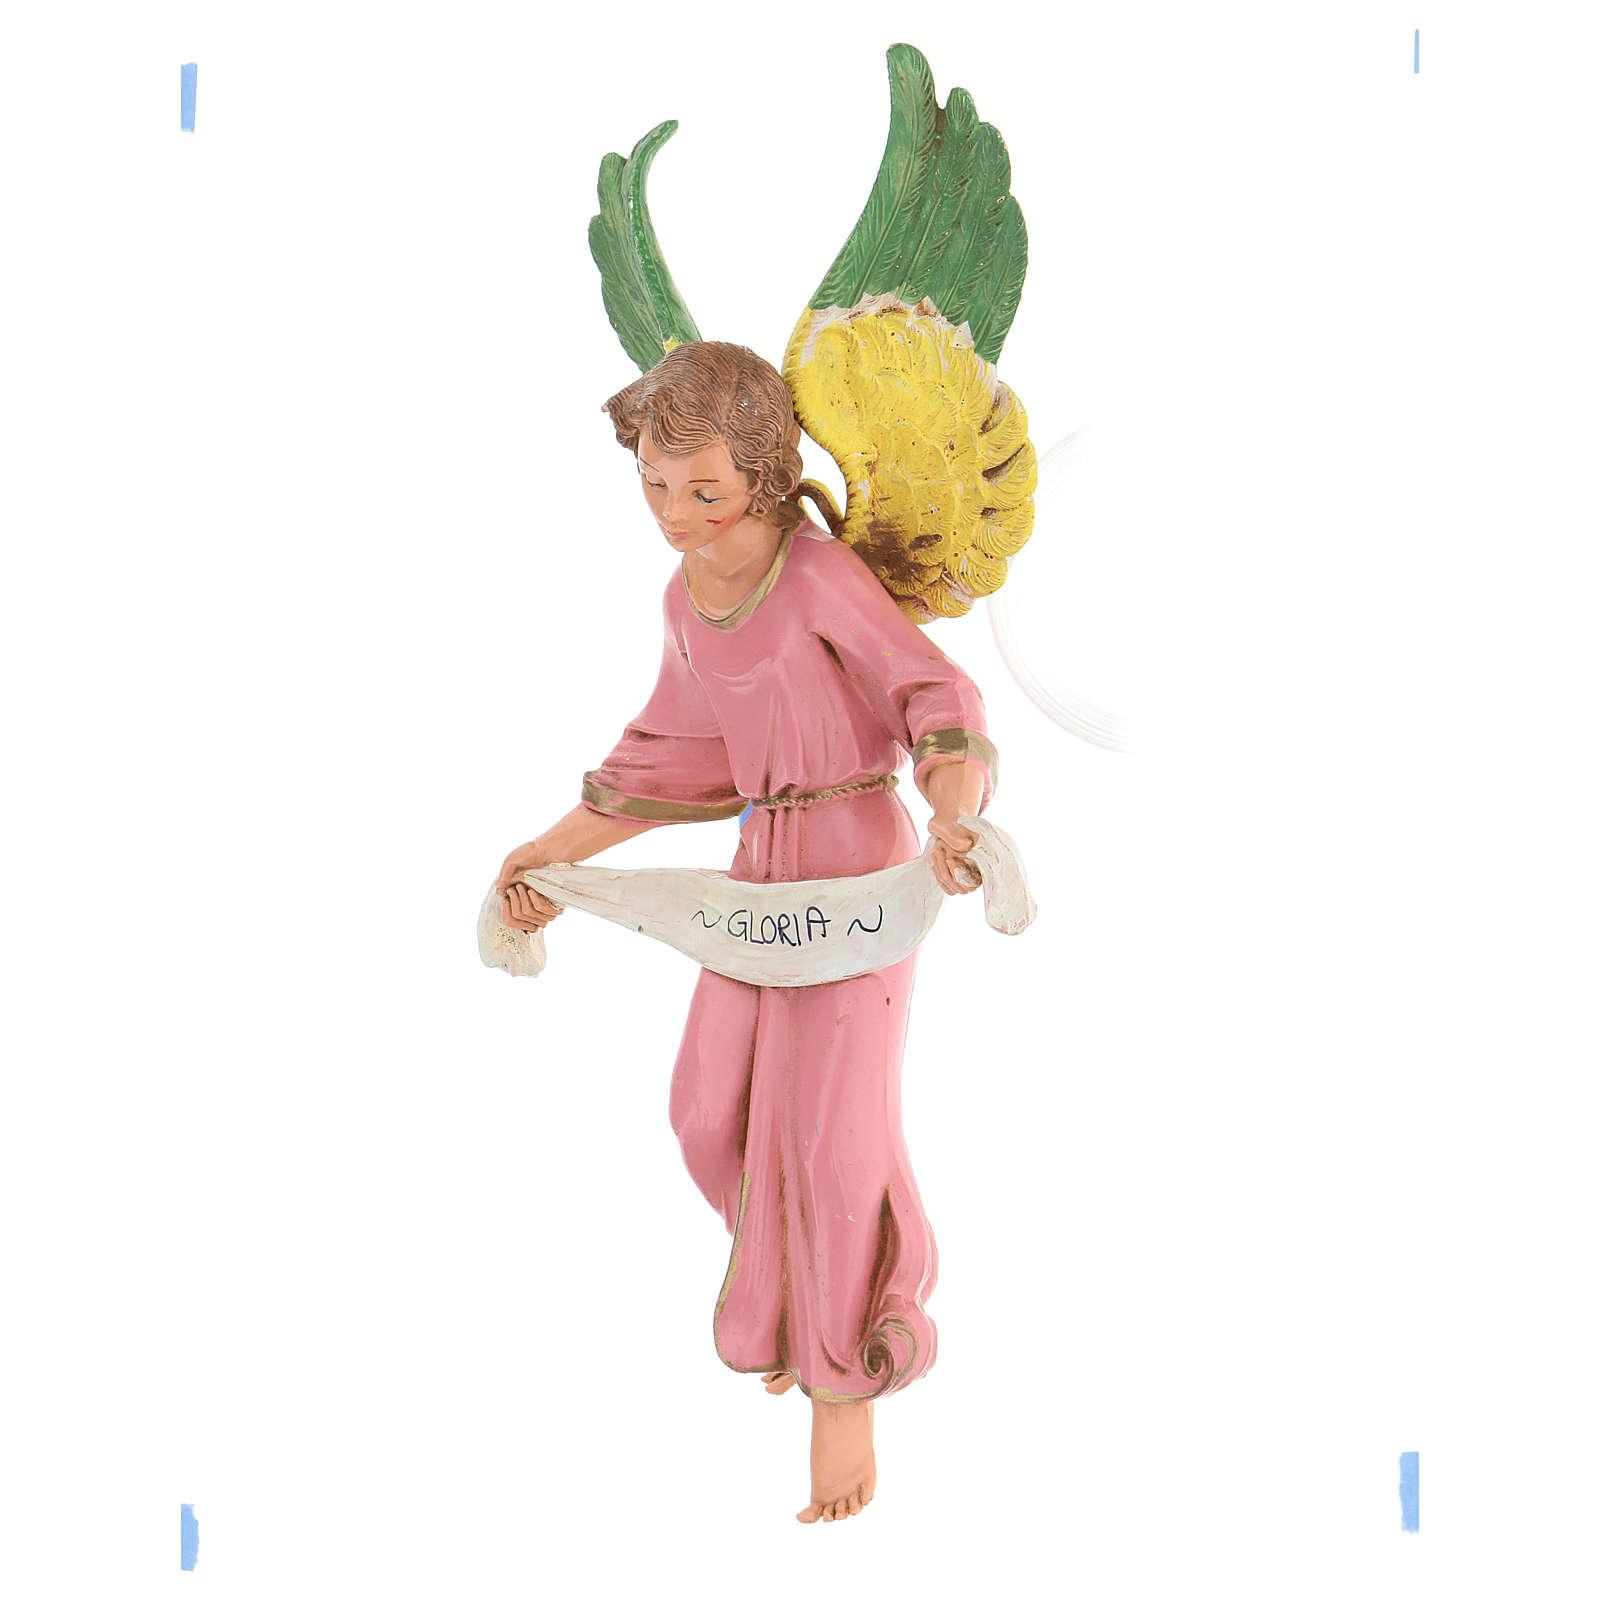 Ange gloire rose 30 cm Fontanini 4